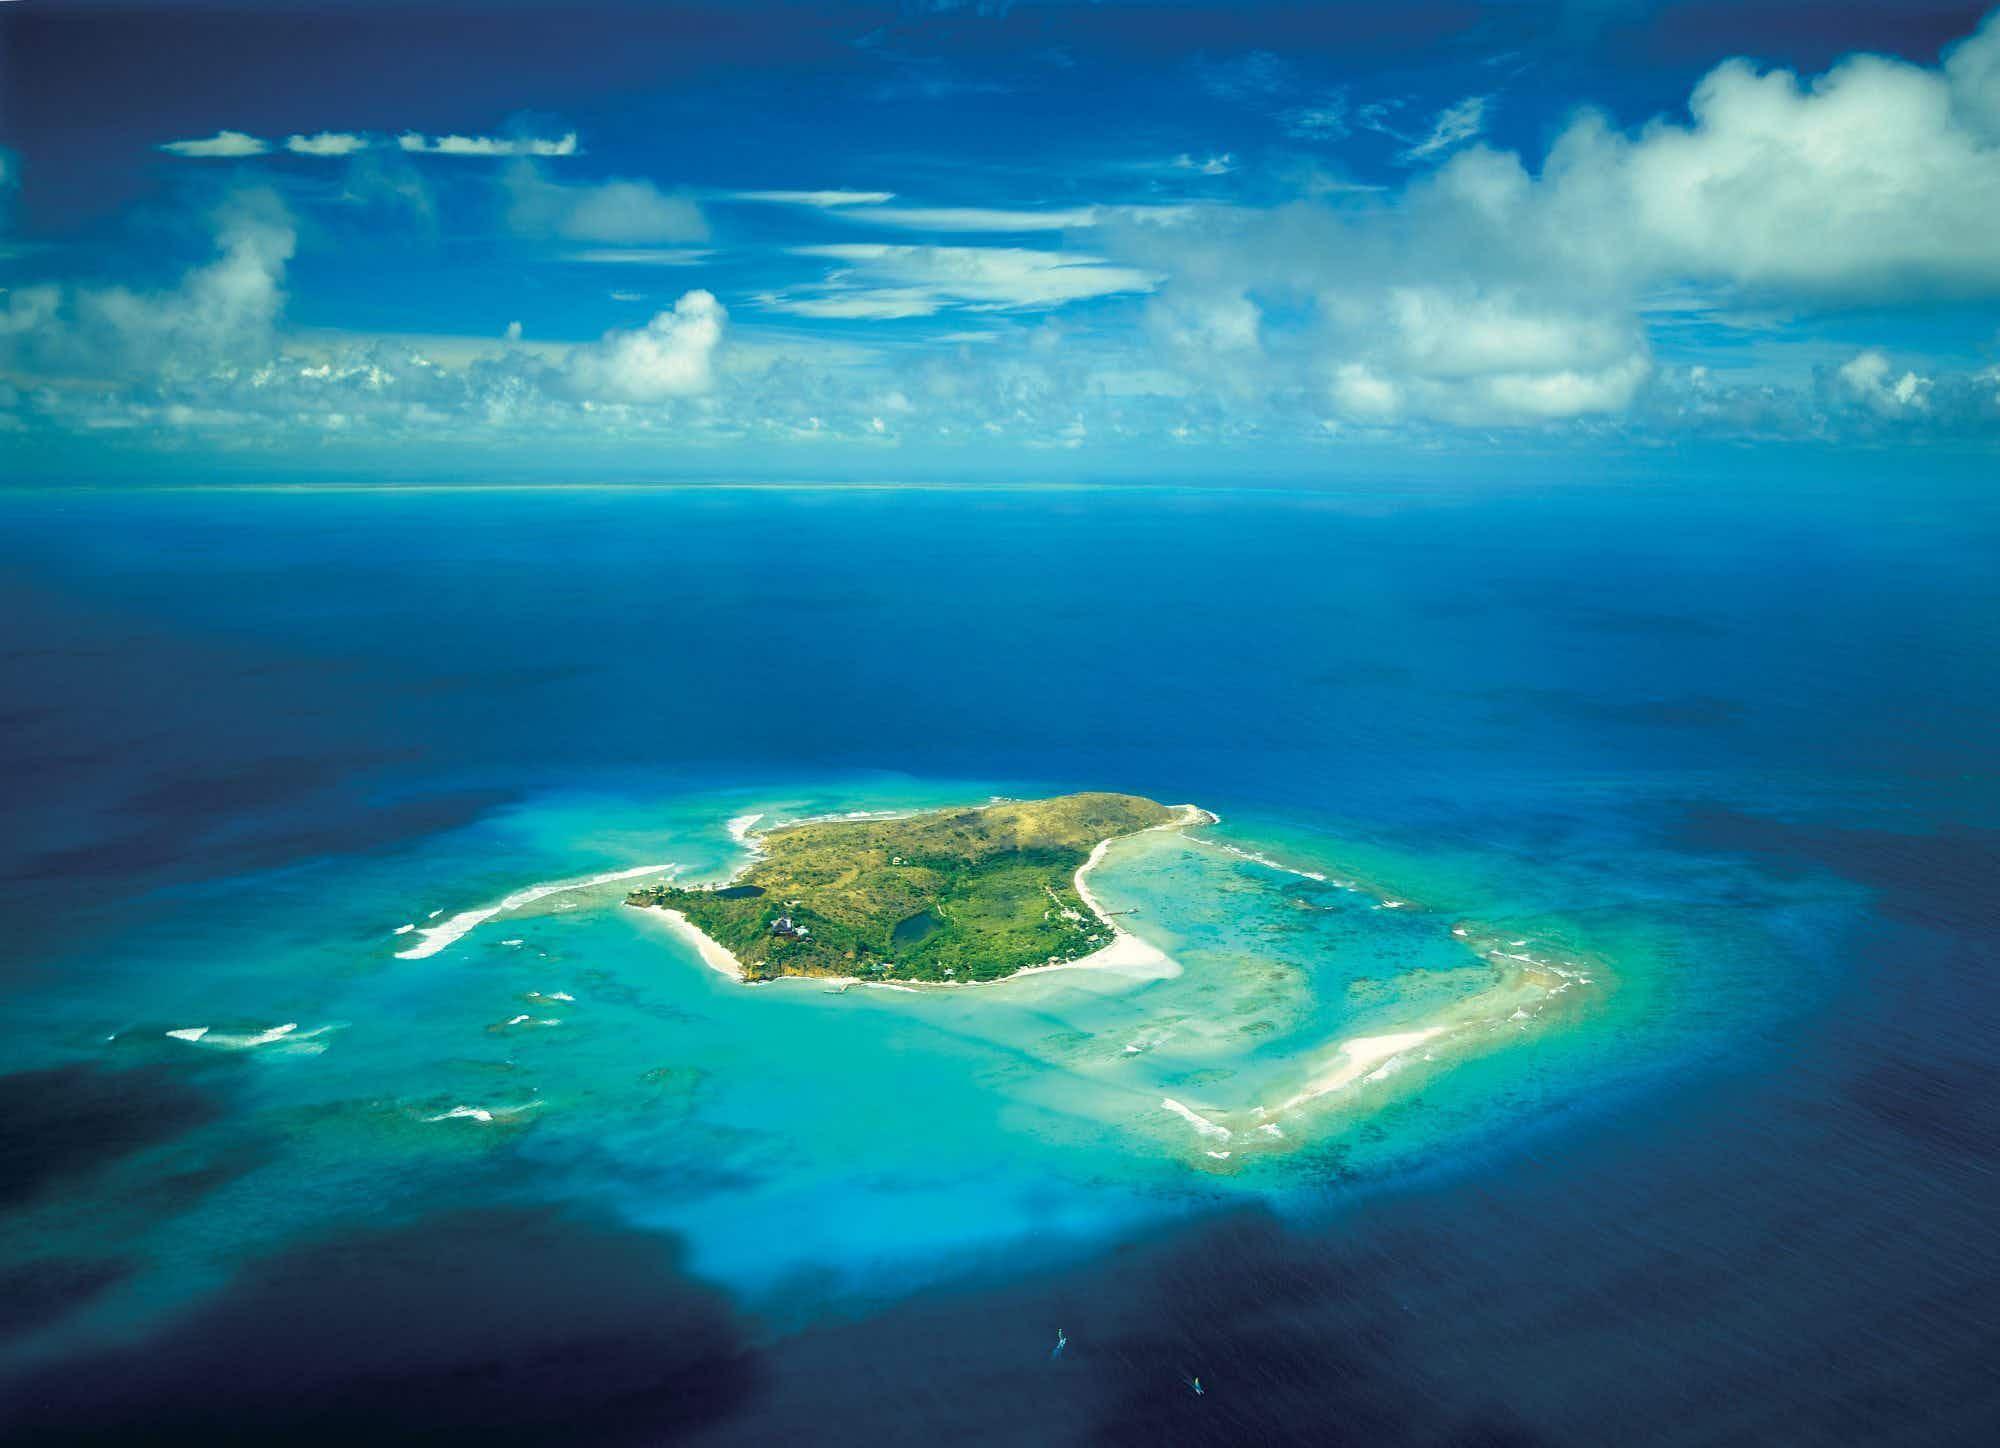 Work begins to rebuild Richard Branson's luxury Caribbean getaway